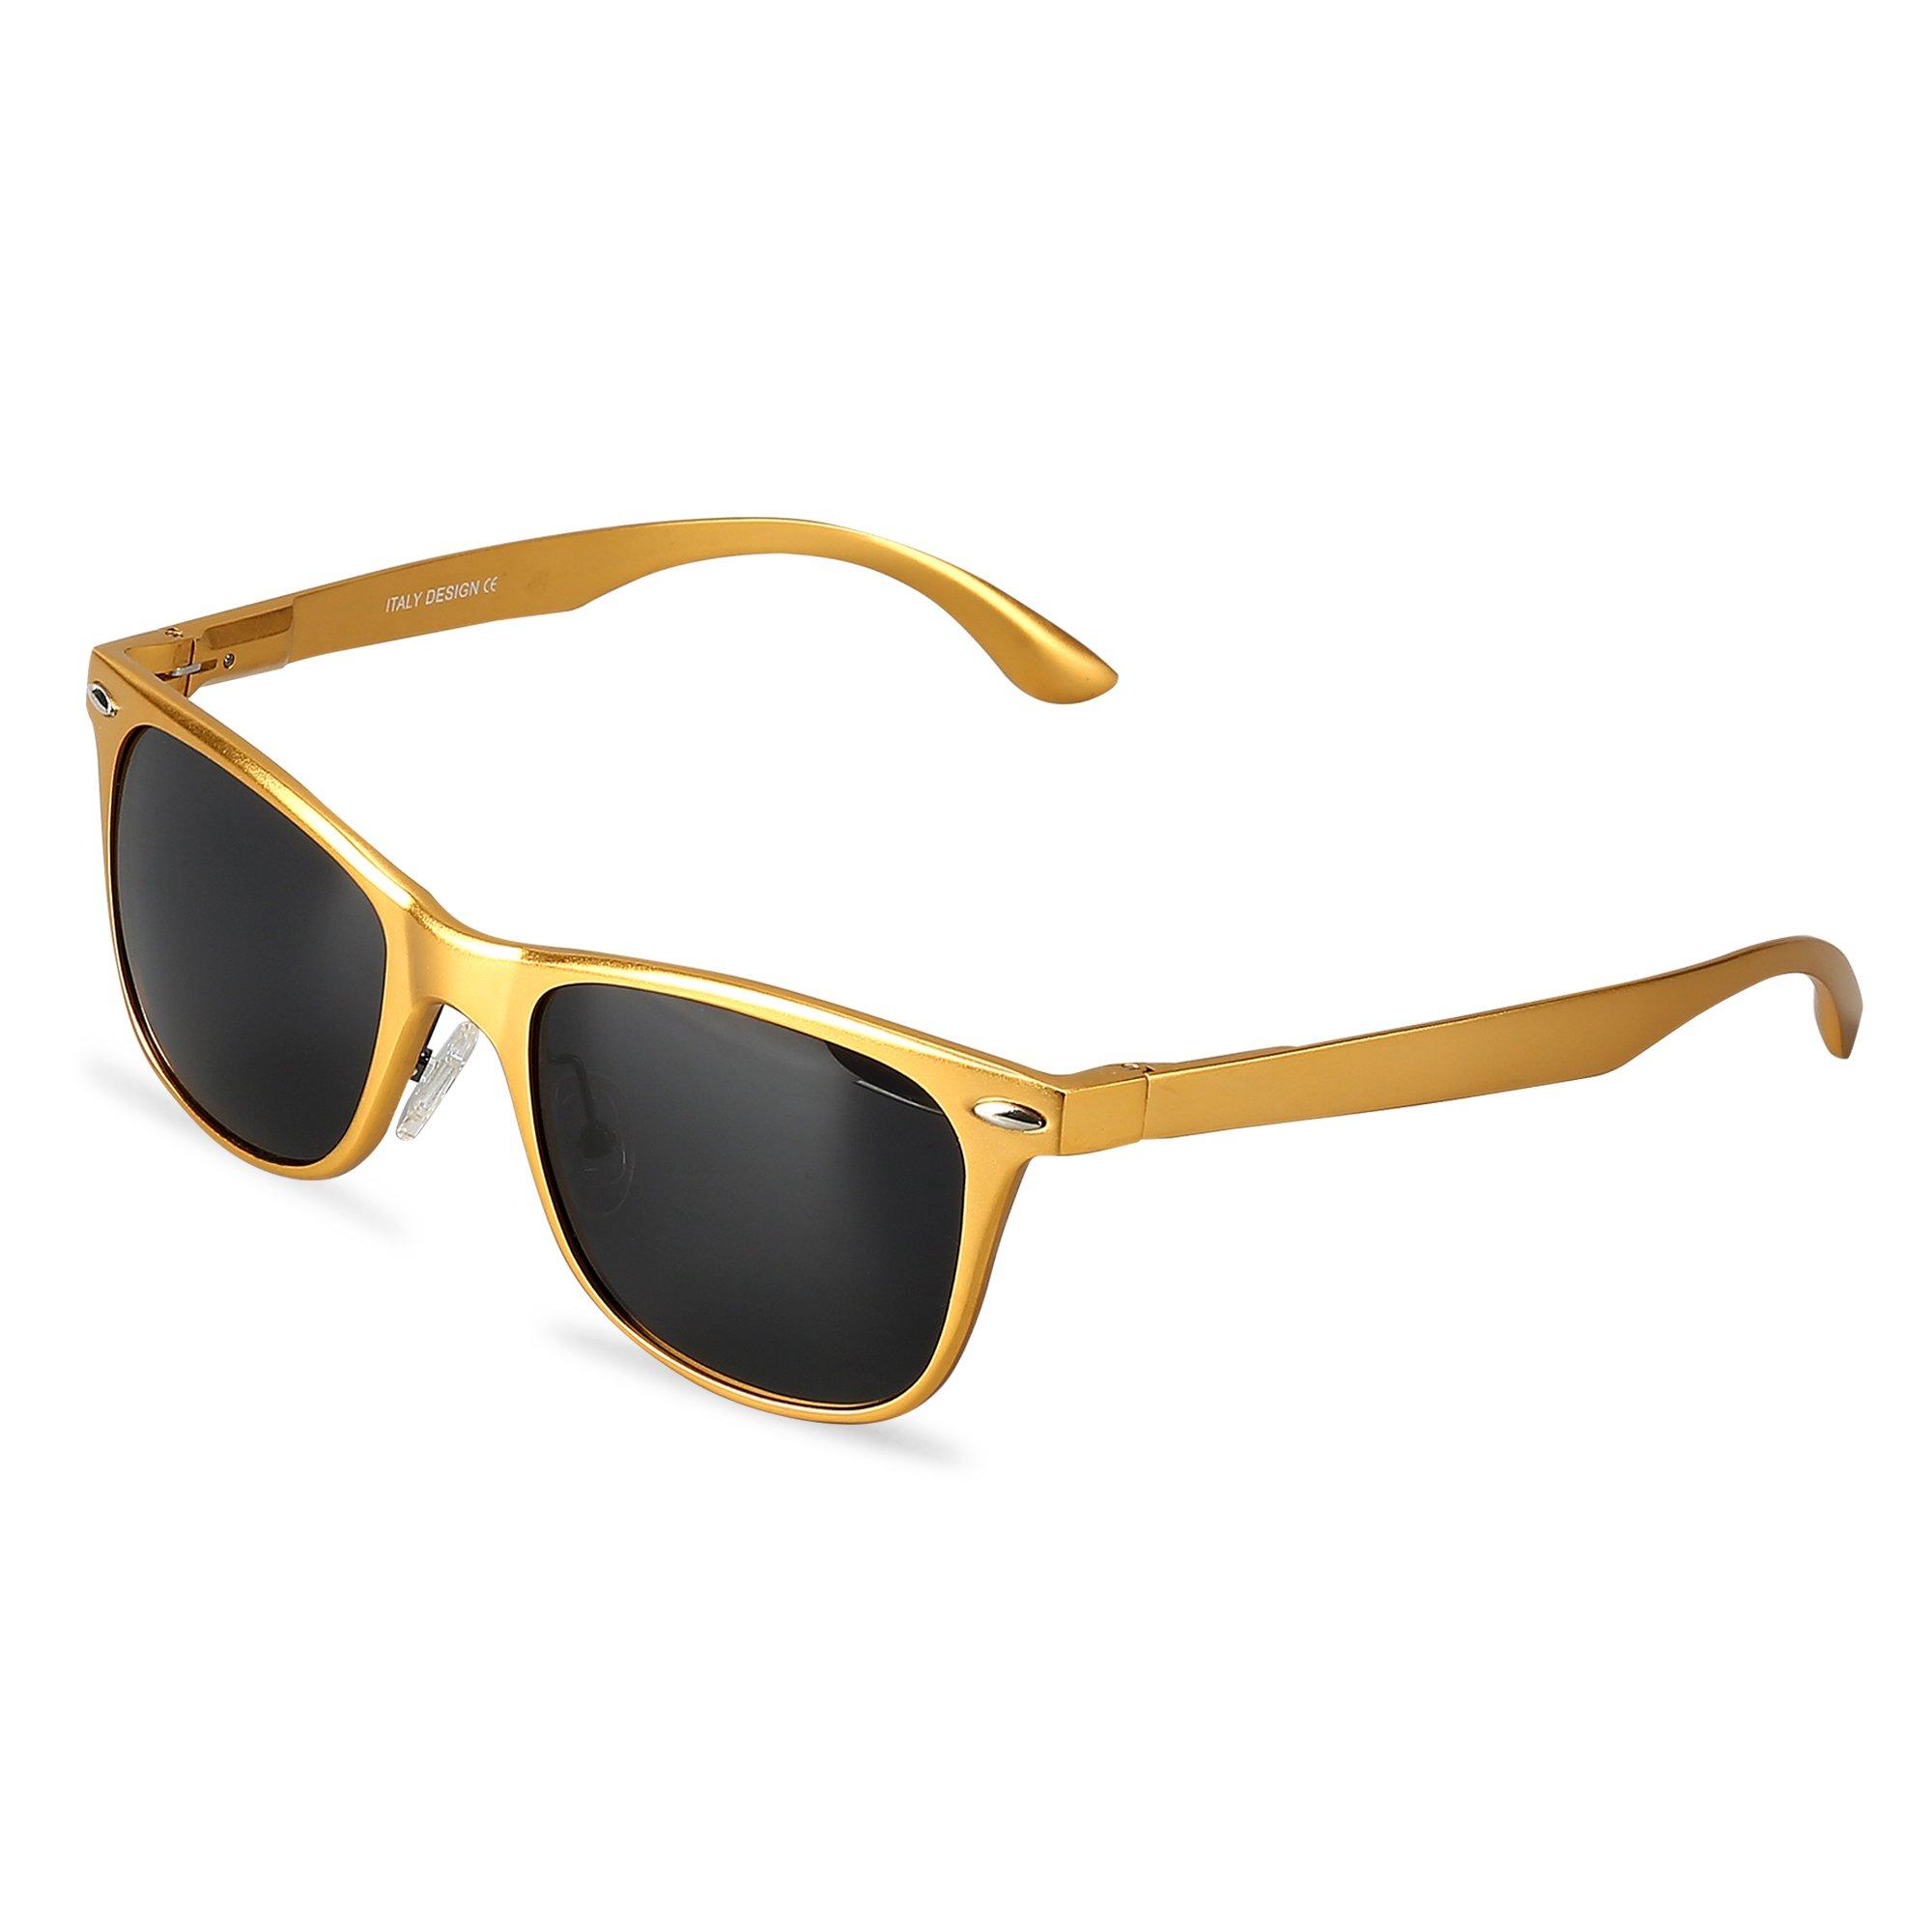 Wayfarer Polarized Sunglasses With Gift Box UV Protection Sports Floating Cycling LeadallwayTM(golden frame darkgrey lens)